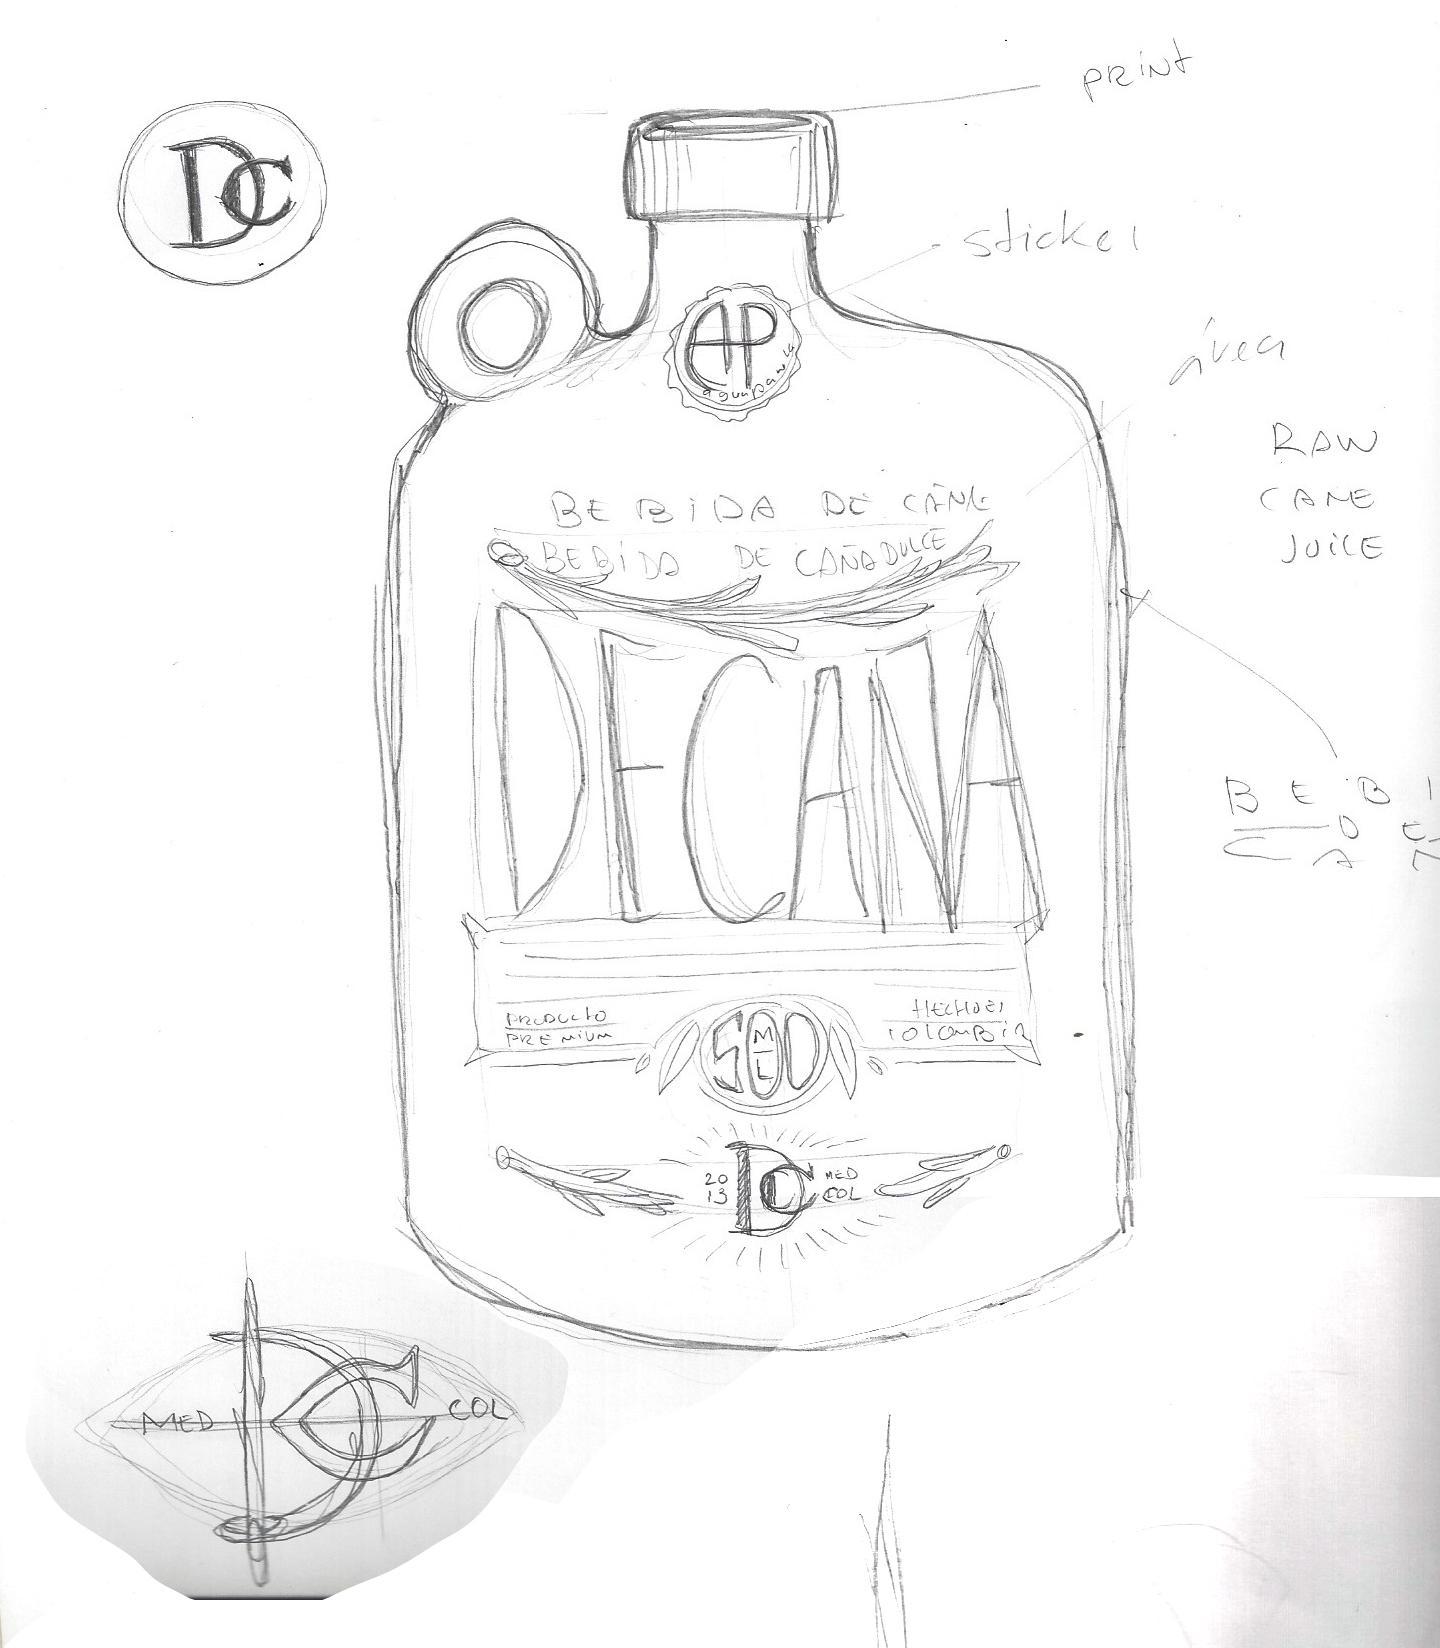 Panela Label : DECAÑA - image 17 - student project